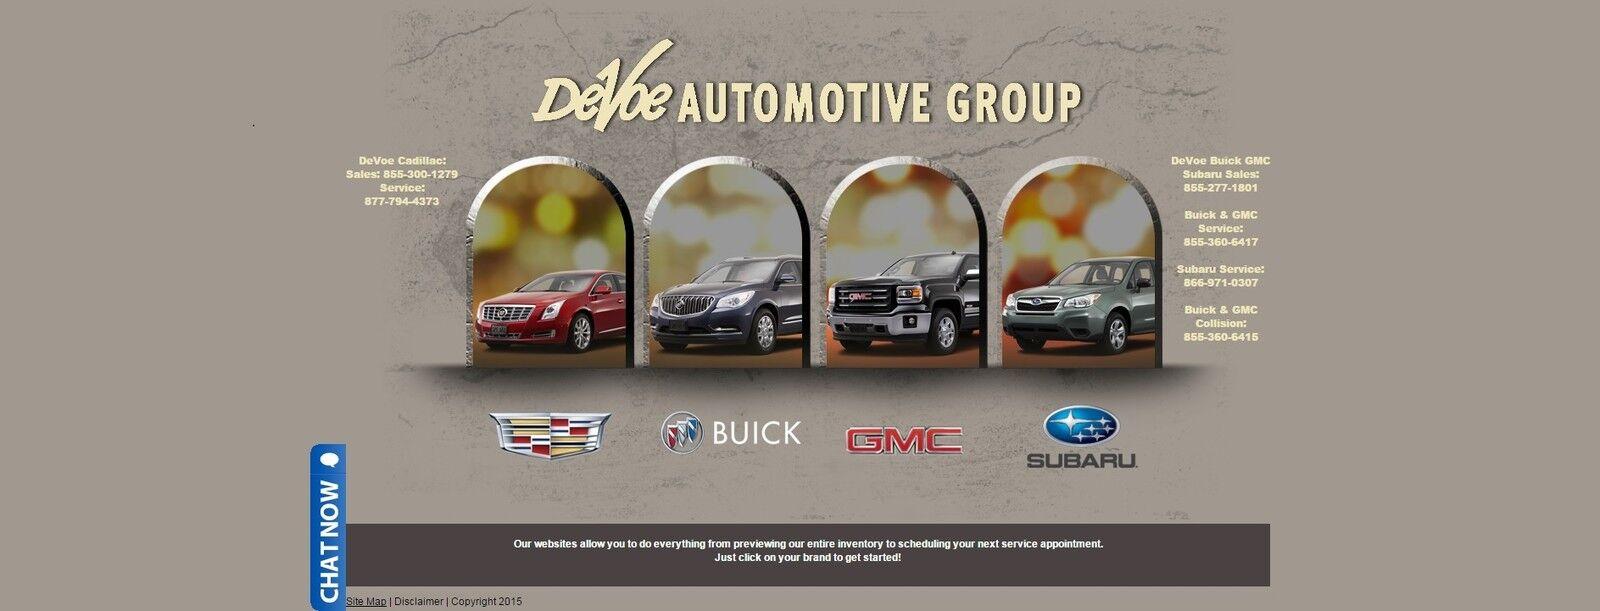 DeVoe Automotive Group